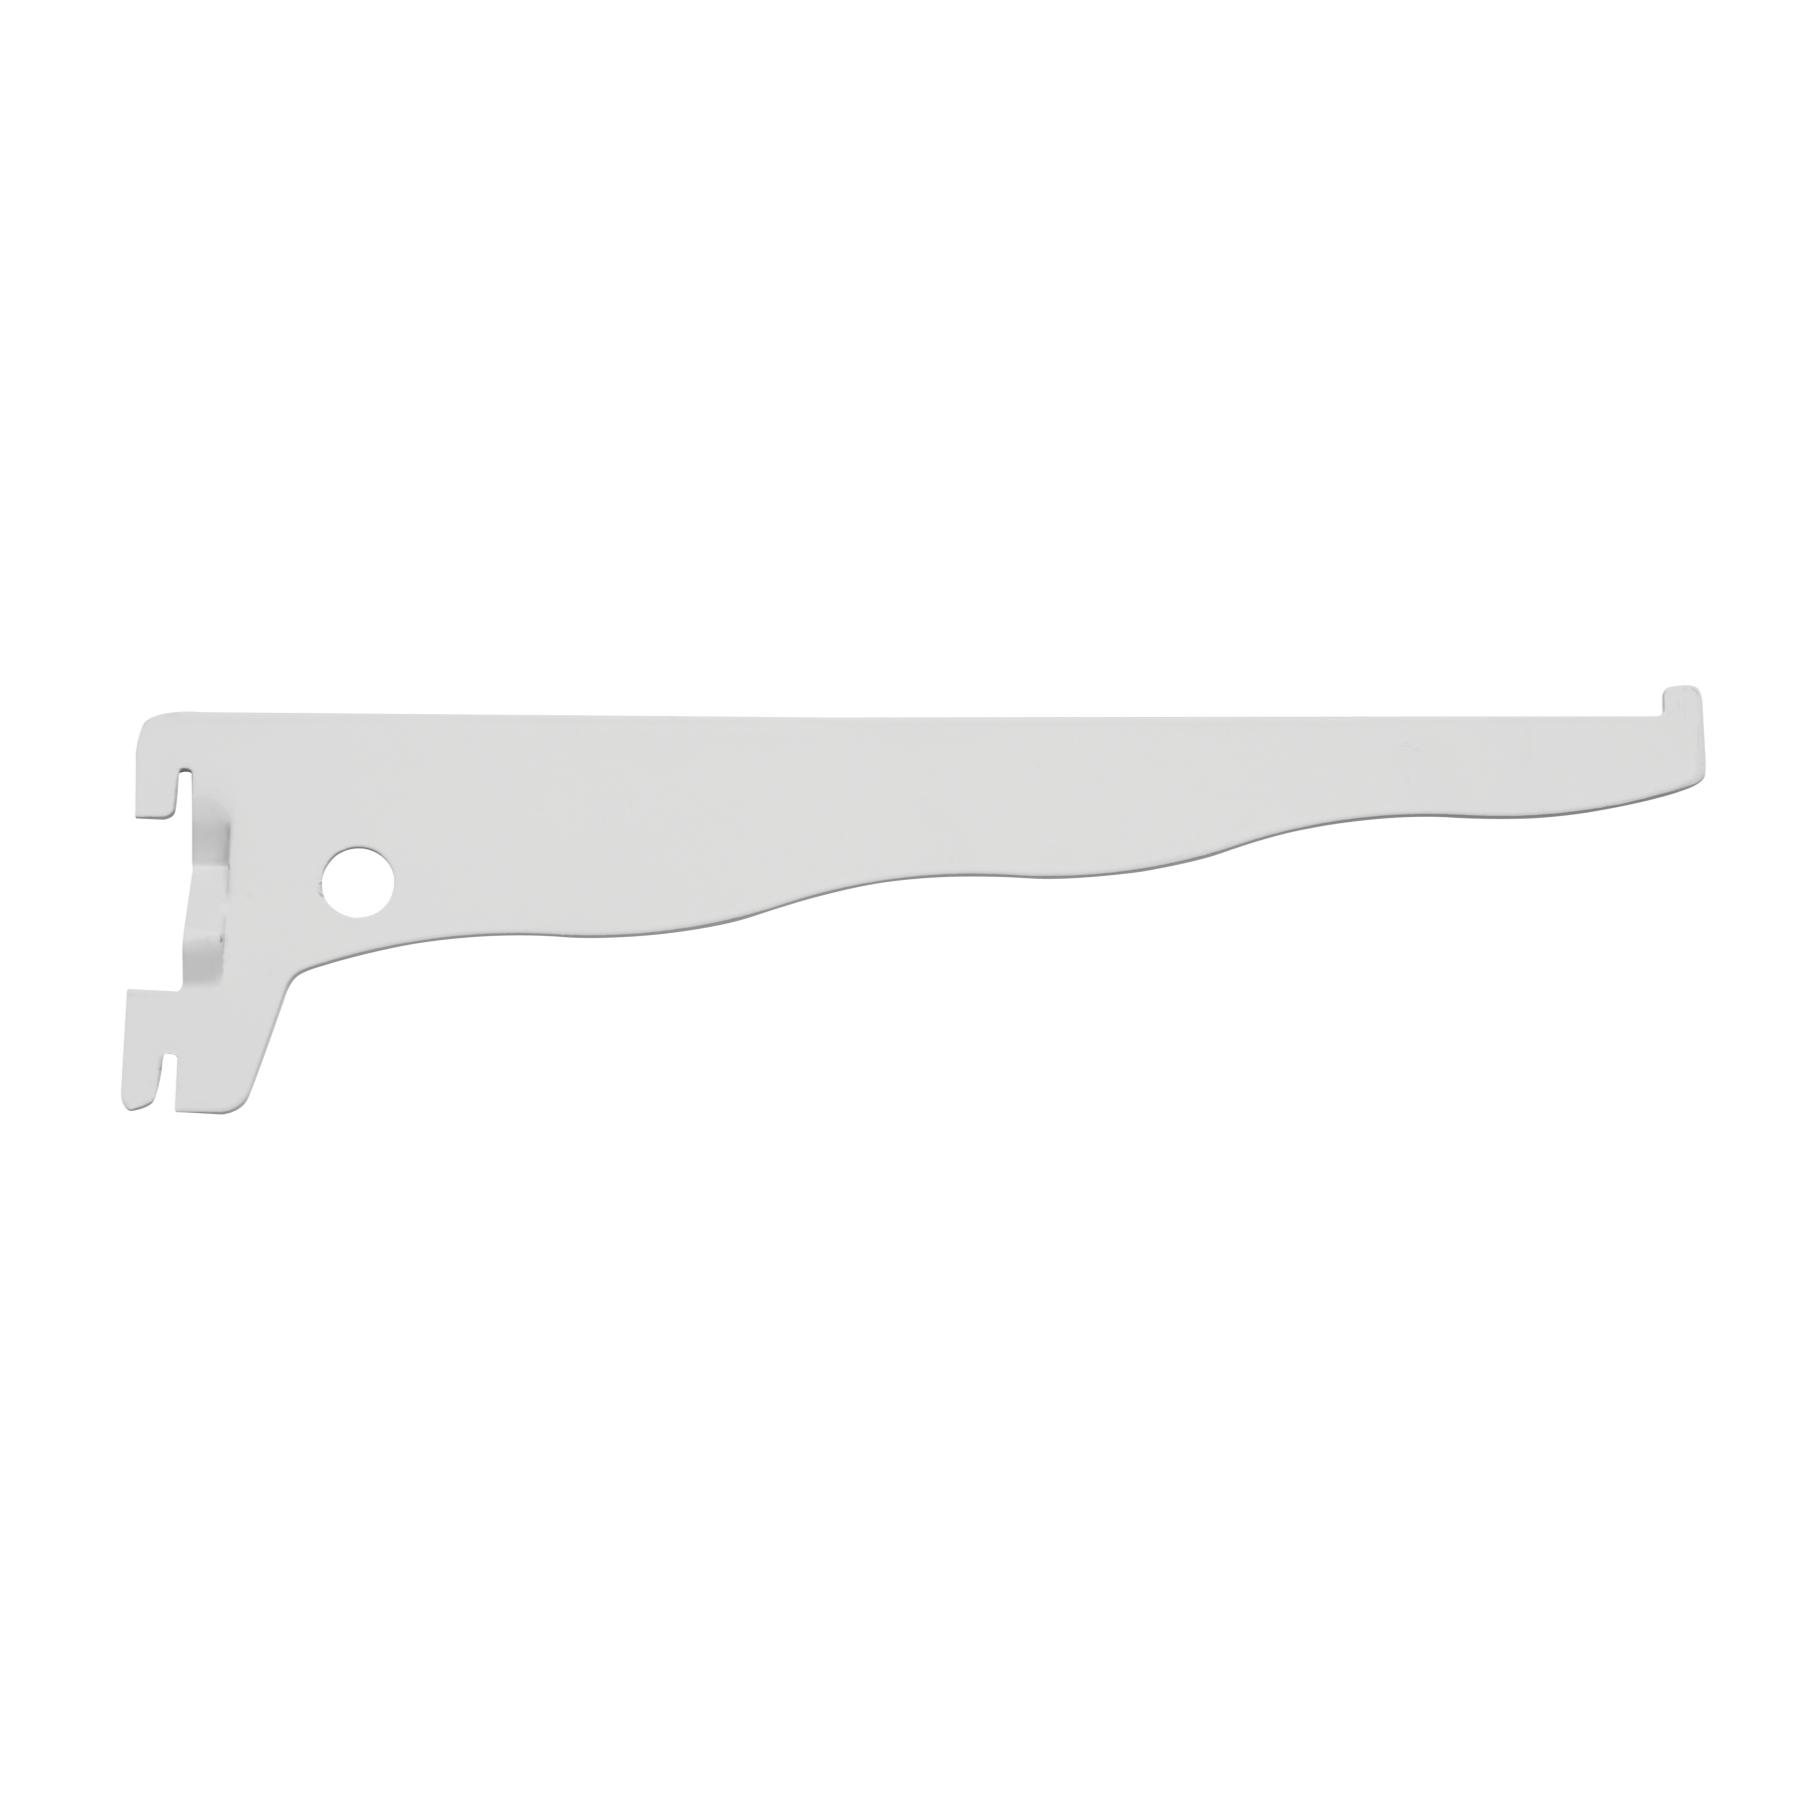 Suporte para Trilho de Aco 40 cm Branco 040 - Prat-k